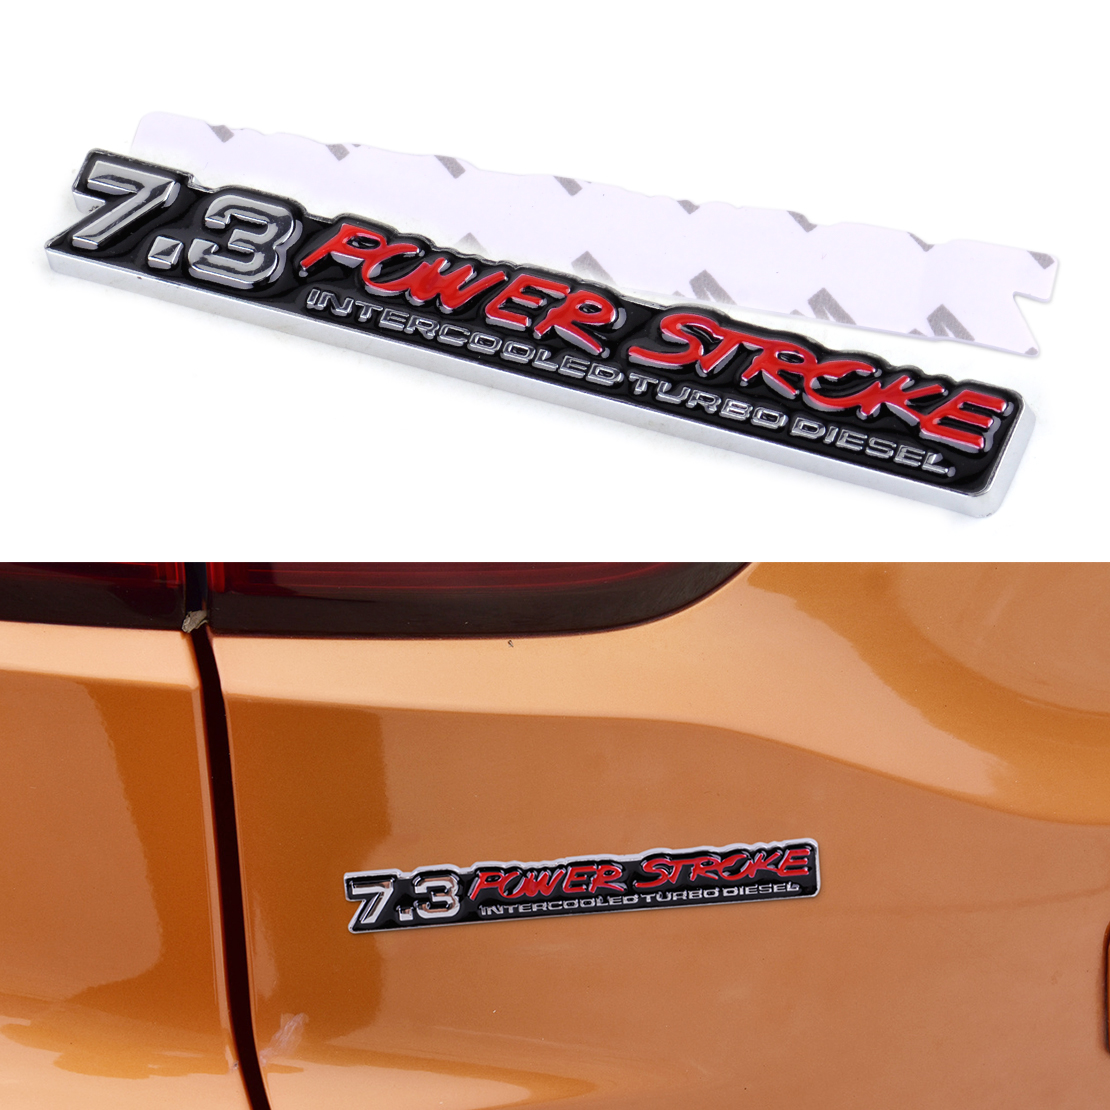 DWCX Car Boot Truck 7.3 Powerstroke Intercooled Turbo Diesel Emblem Badge Decal Sticker for VW Audi BMW Honda Hyundai Kia Ford